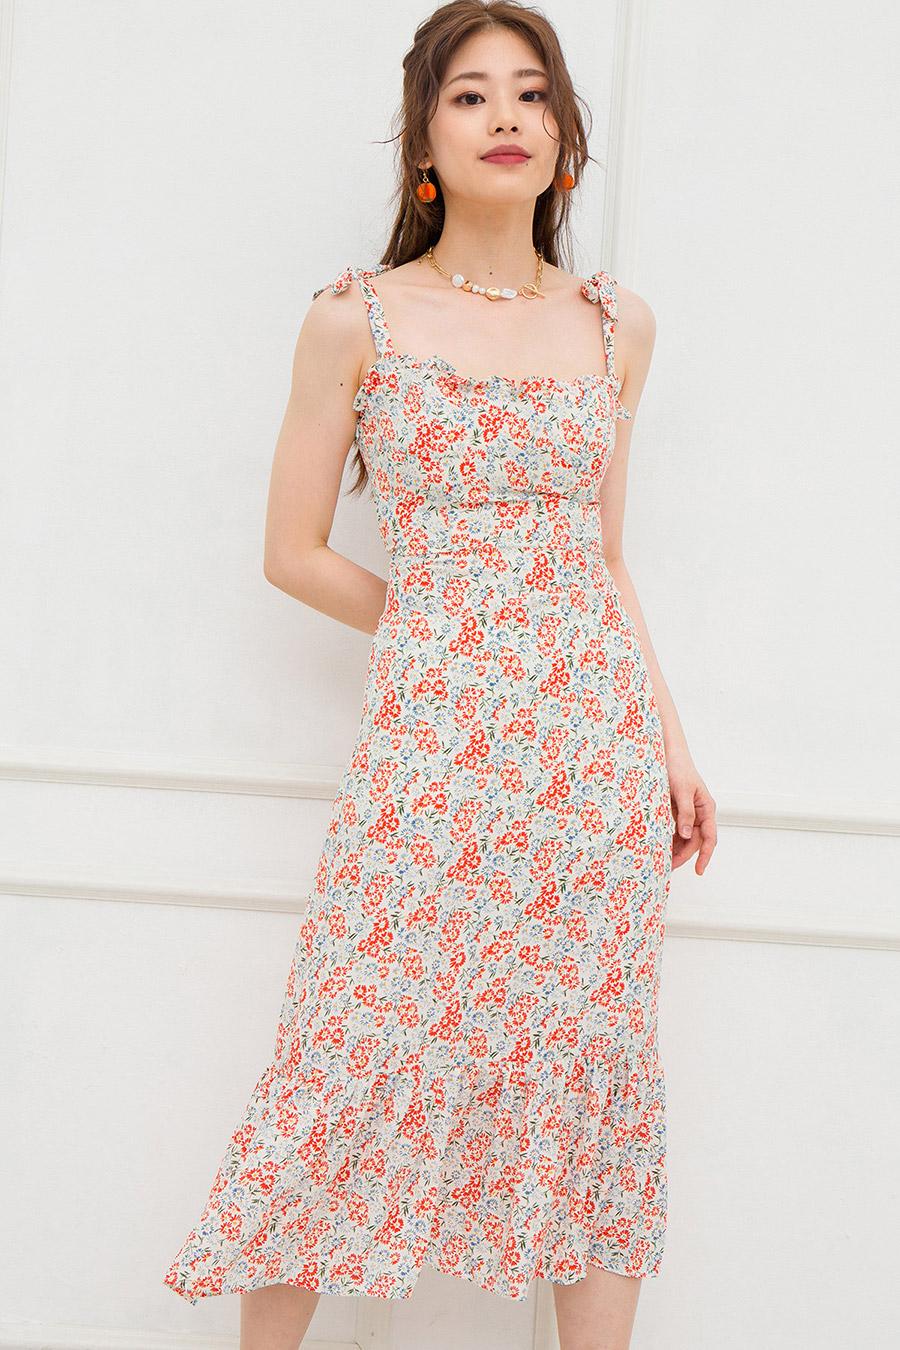 NOYER DRESS - IVORY FLEUR